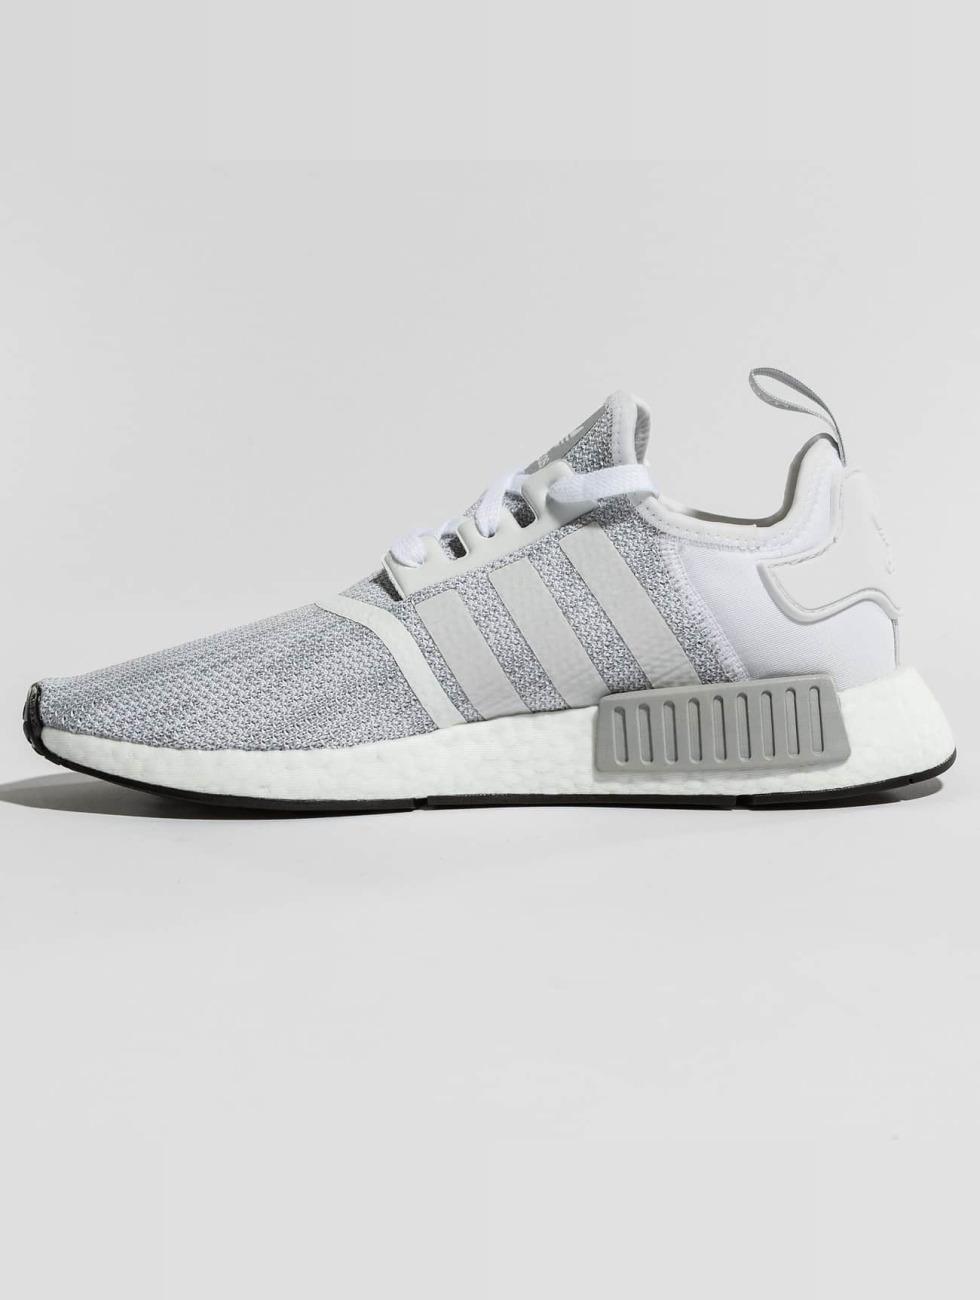 Adidas Originals Scarpa / Sneaker R1 Nmd In Bianco 478 797 HQoYBAIpk